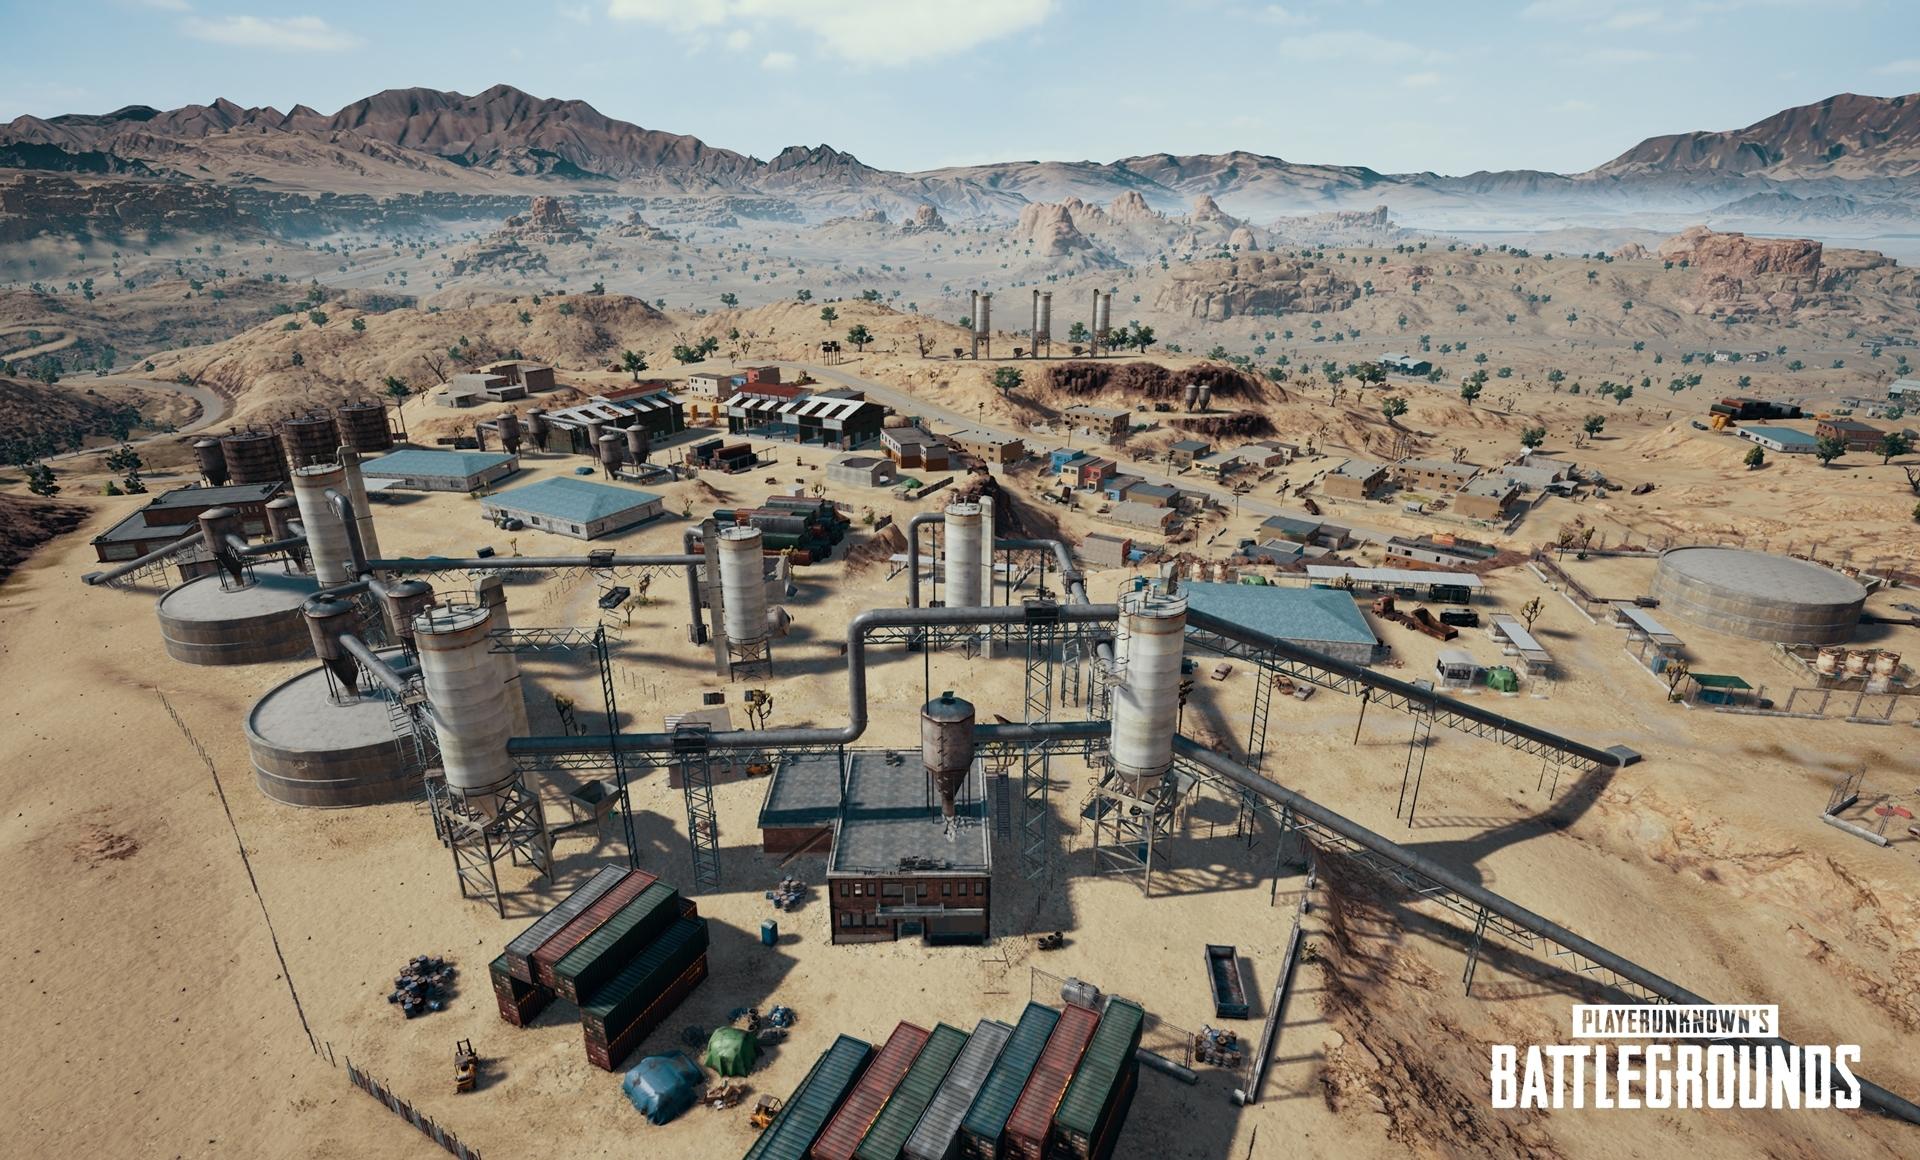 PUBG 砂漠新マップ「ミラマー」公開!名称や詳細はが明らかに!